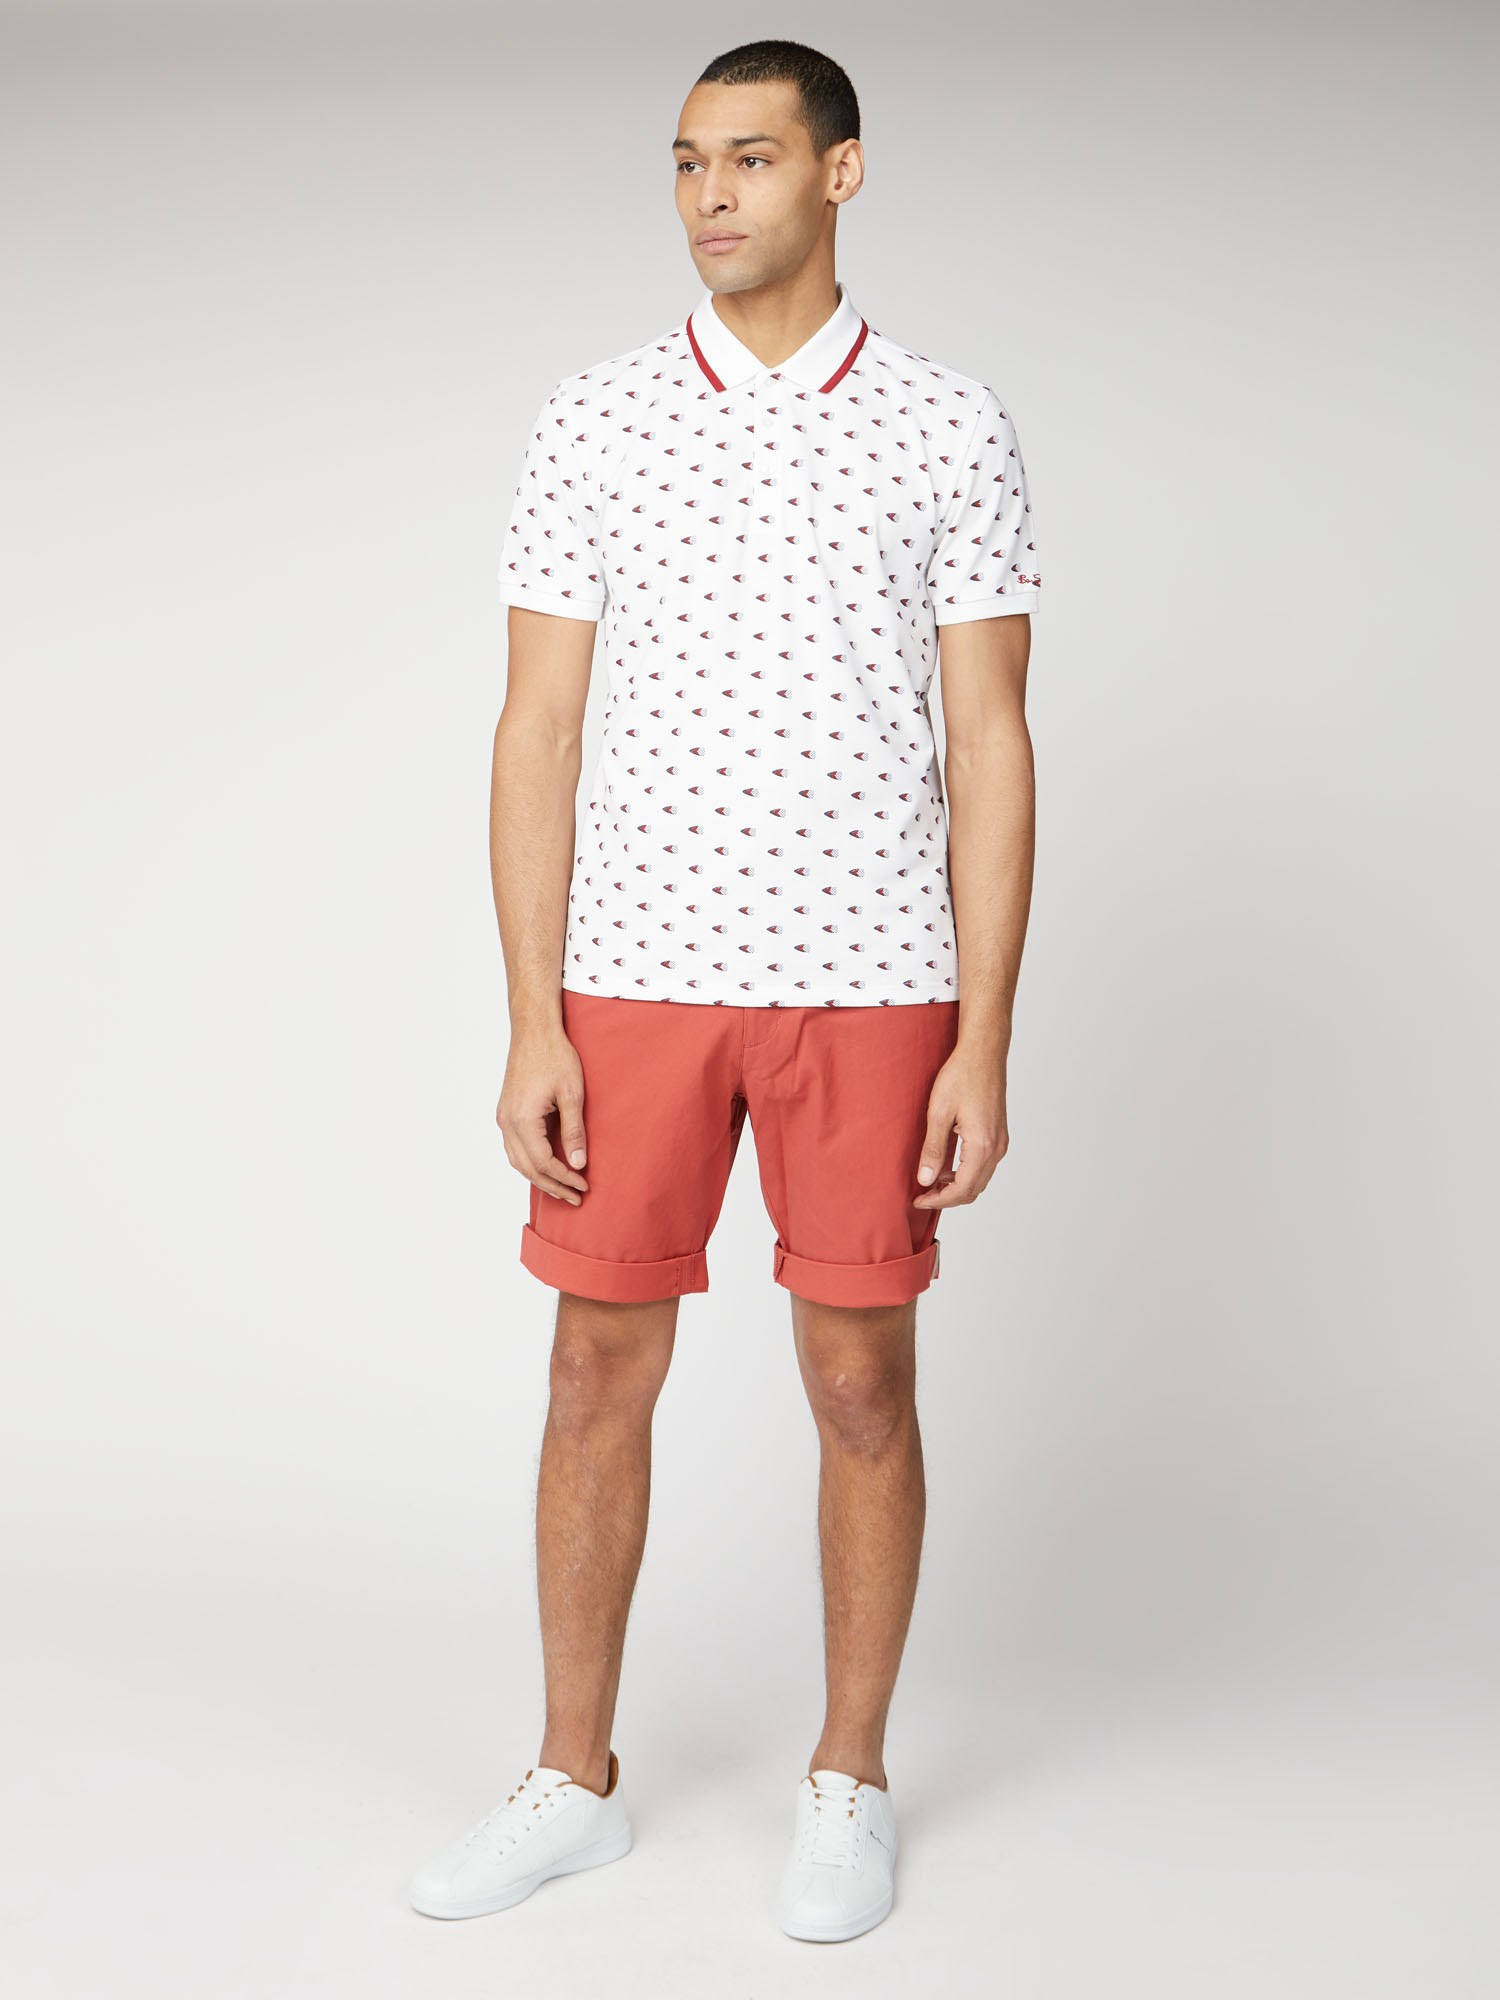 Teracotta Red Cotton Chino Shorts